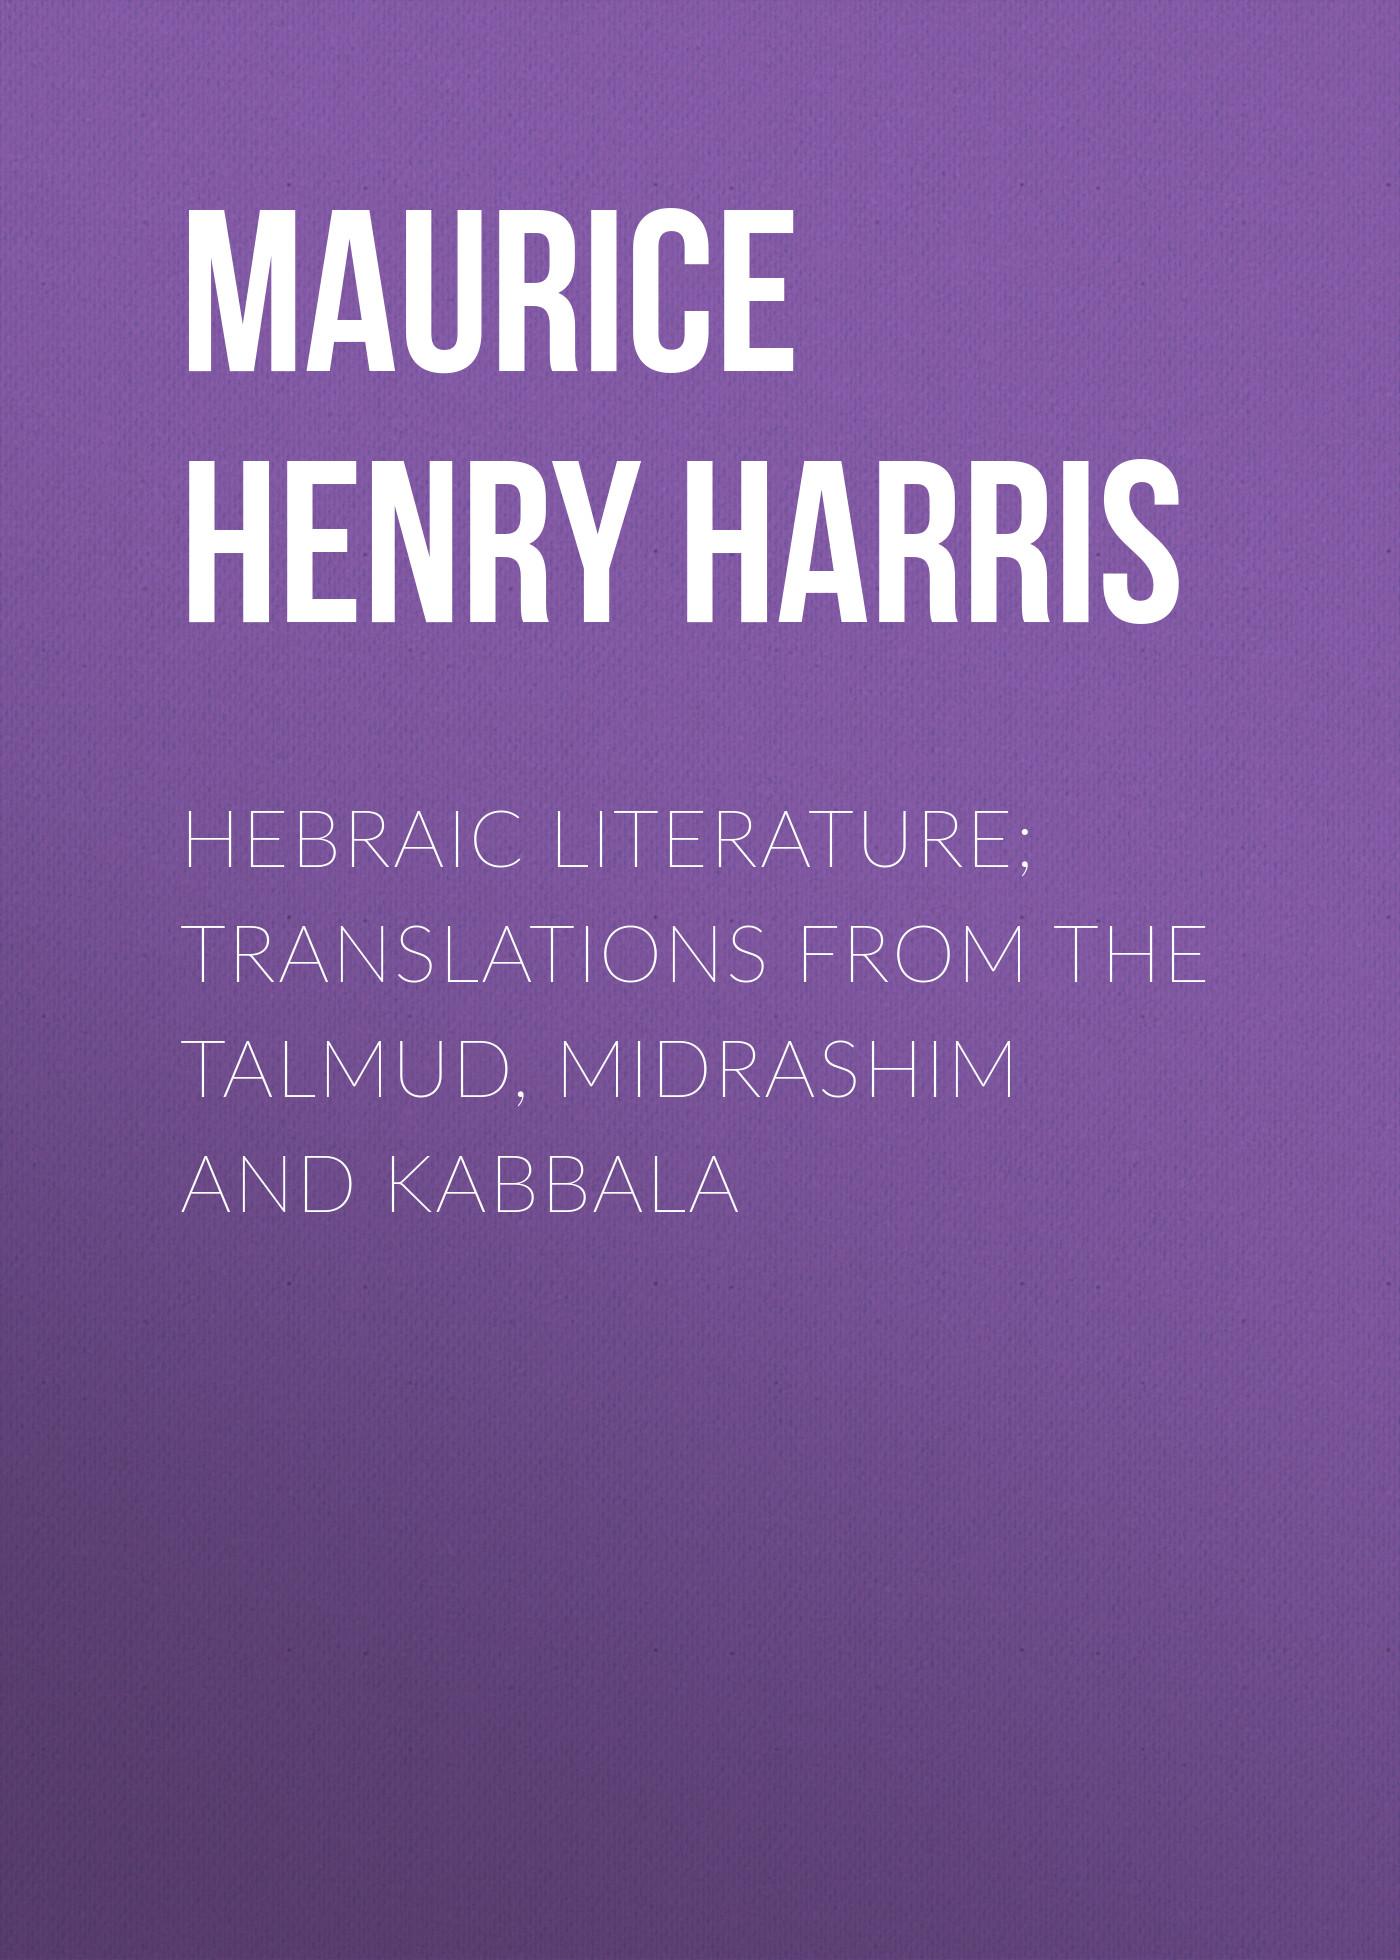 Maurice Henry Harris Hebraic Literature; Translations from the Talmud, Midrashim and Kabbala john lightfoot from the talmud and hebraica volume 1